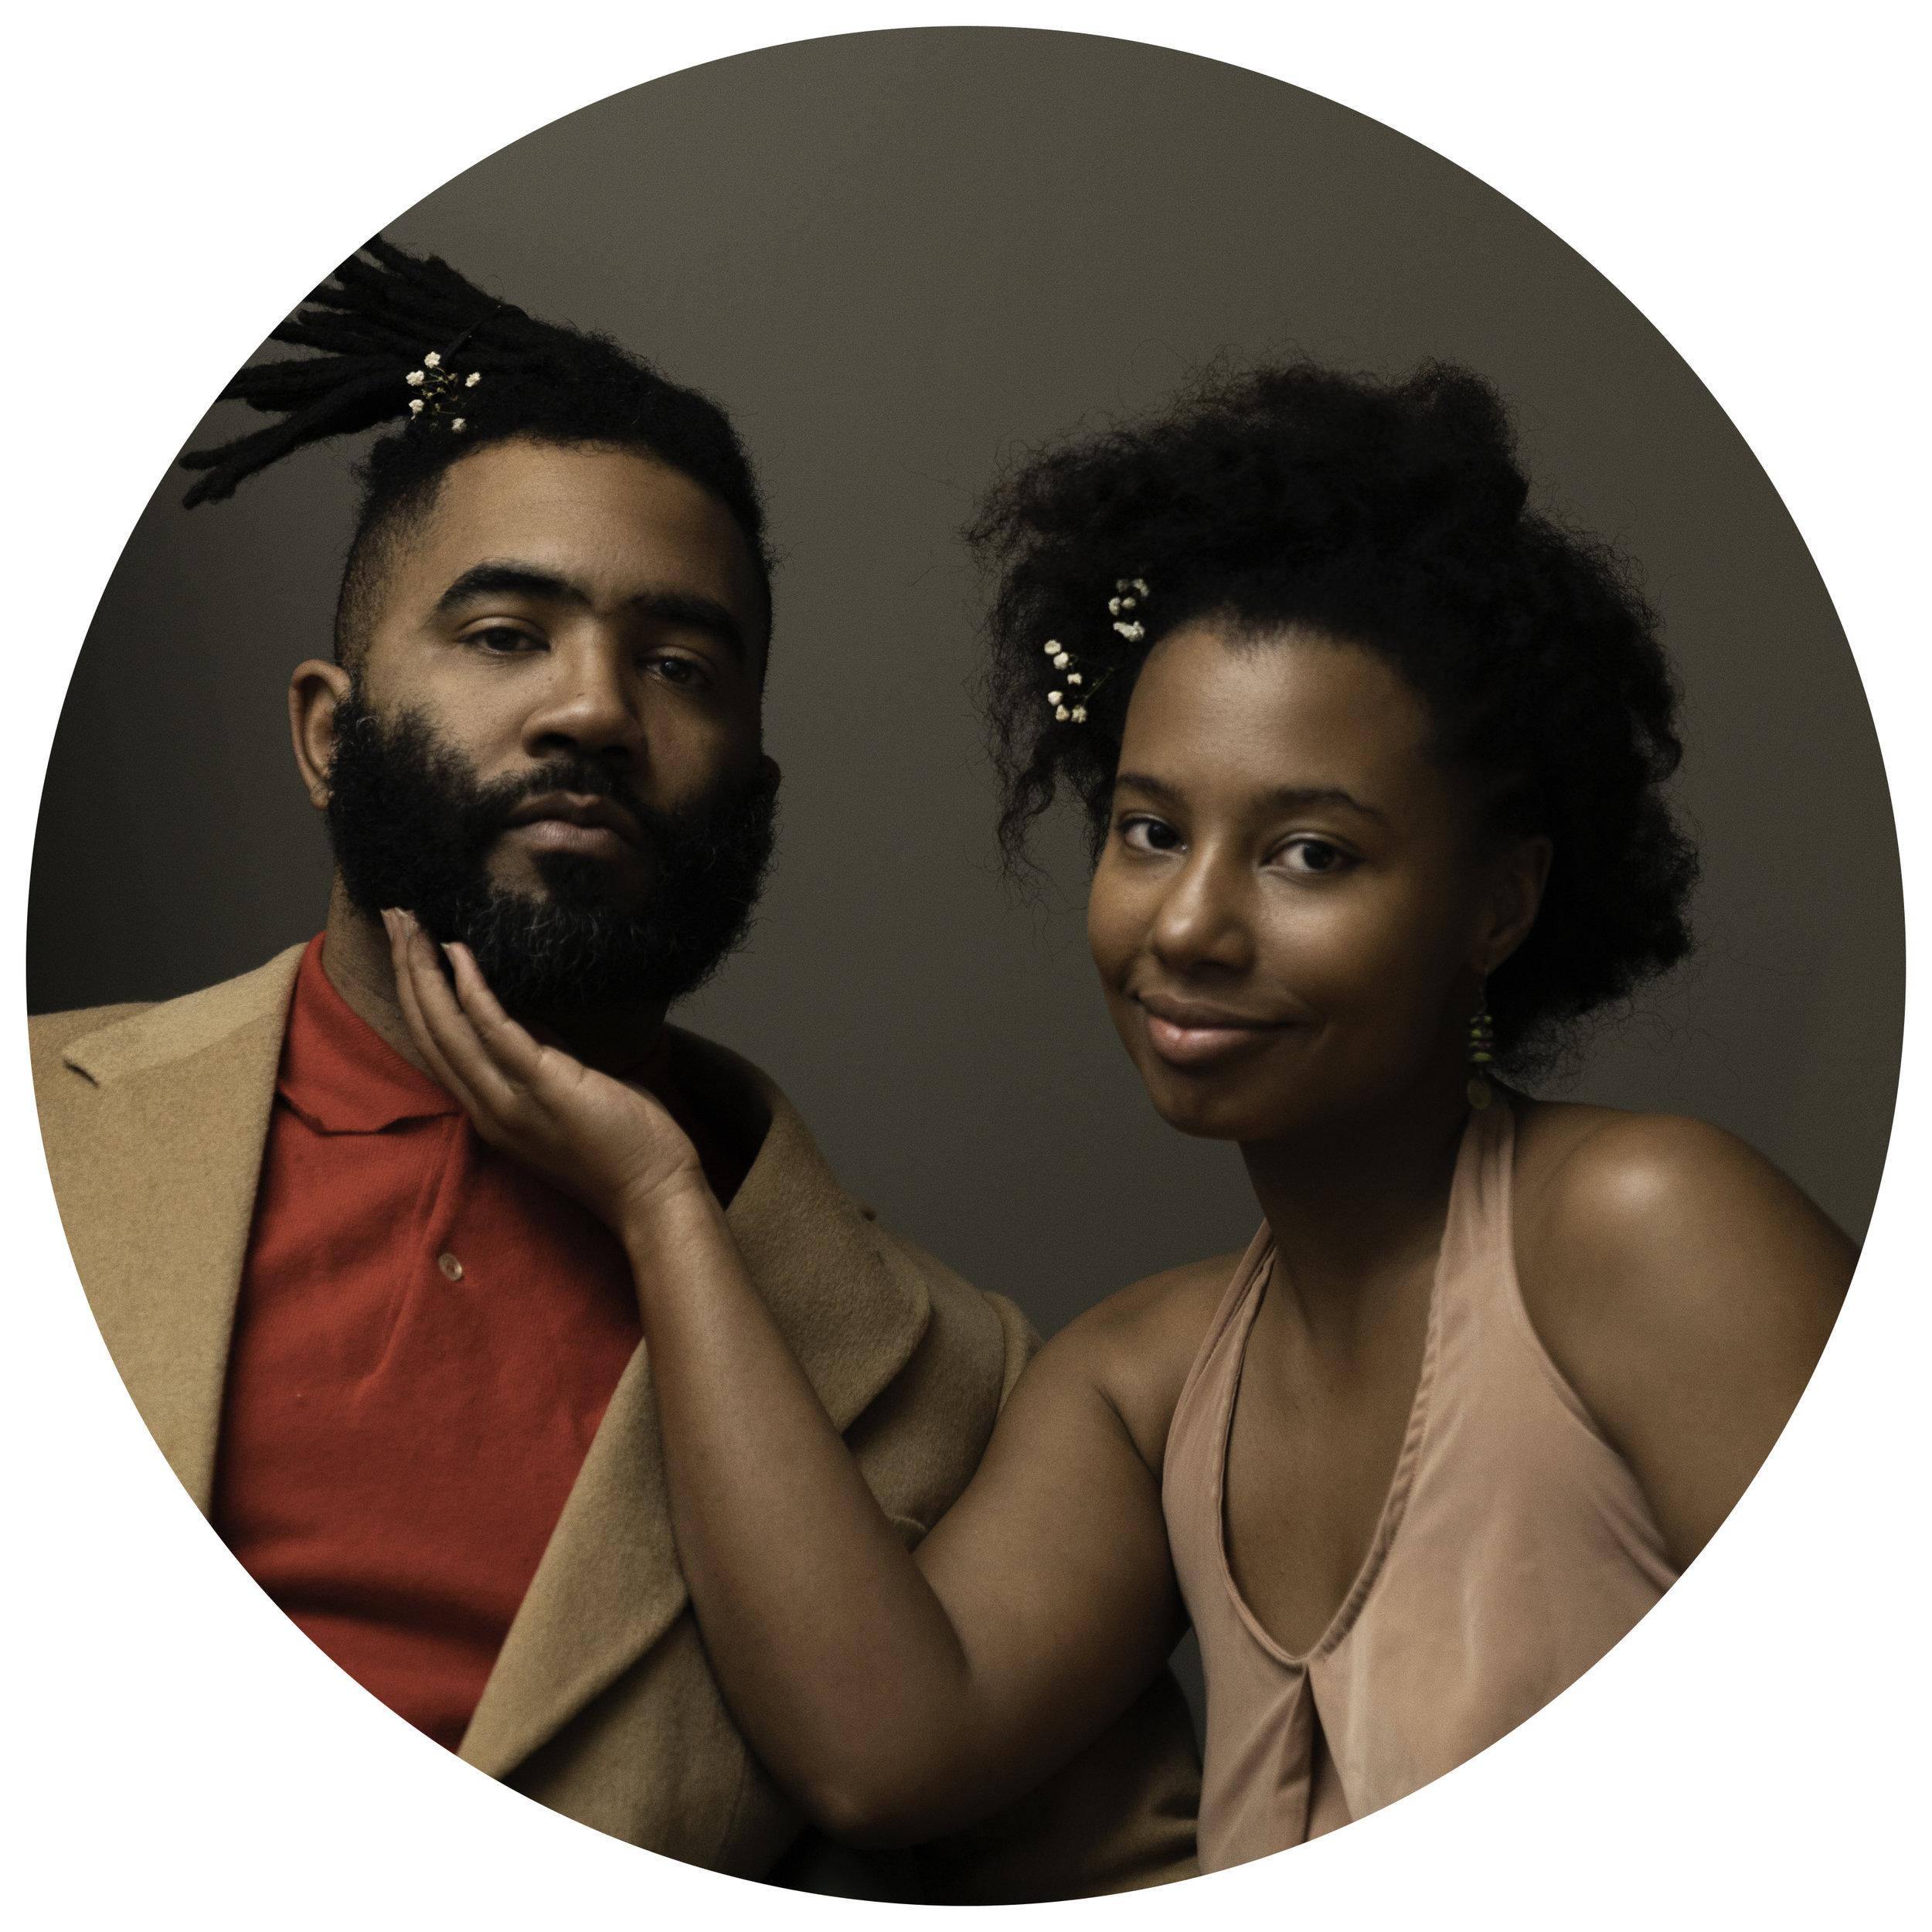 couple-circle-2.jpg